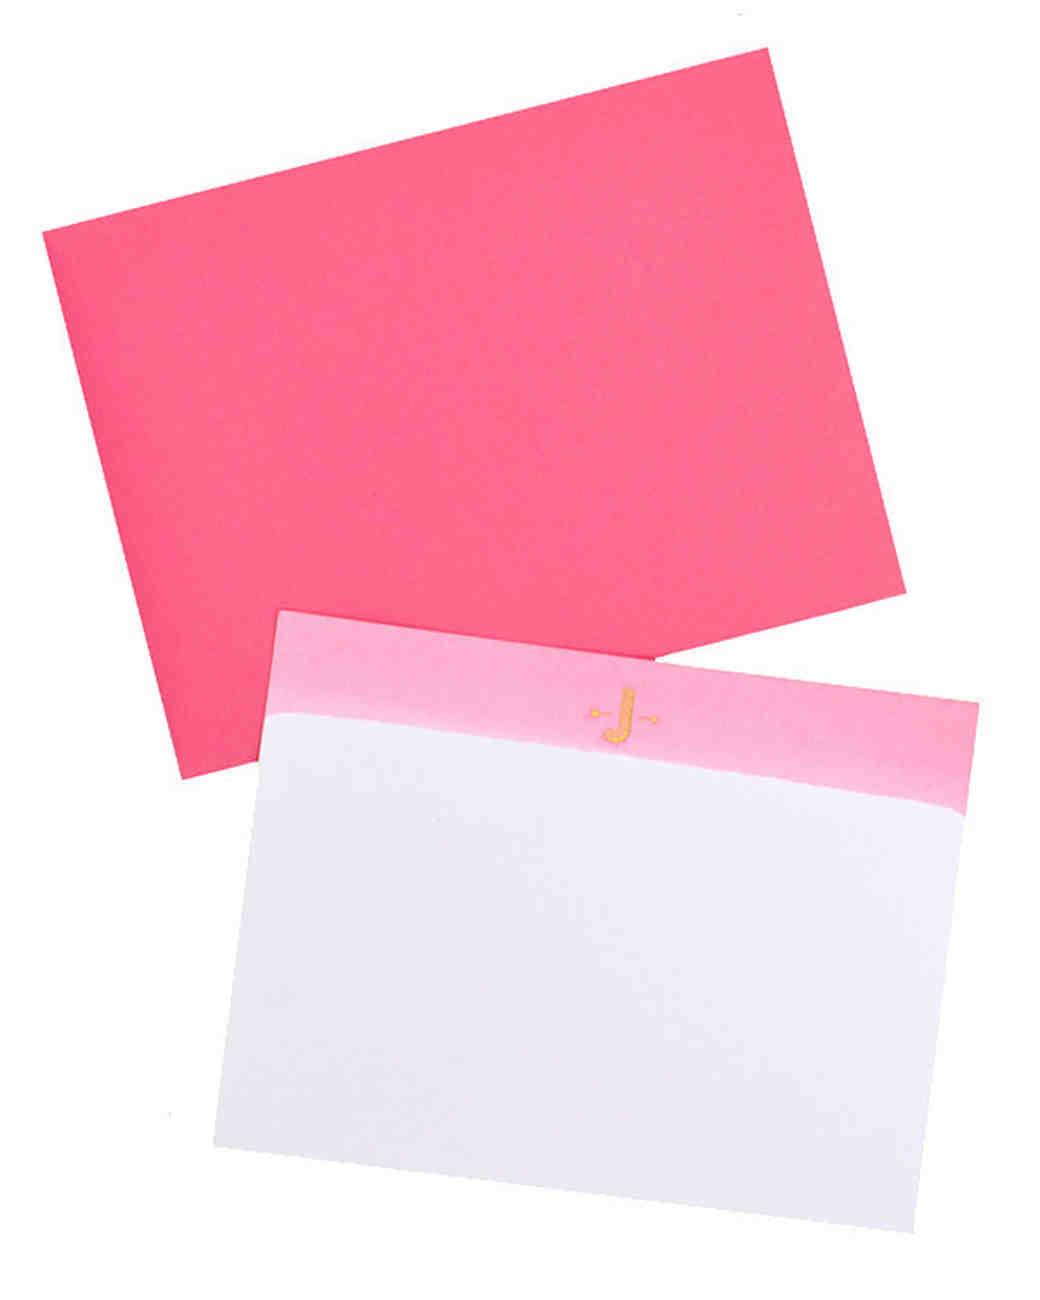 last-minute-gift-ideas-leif-notecards-1215.jpg